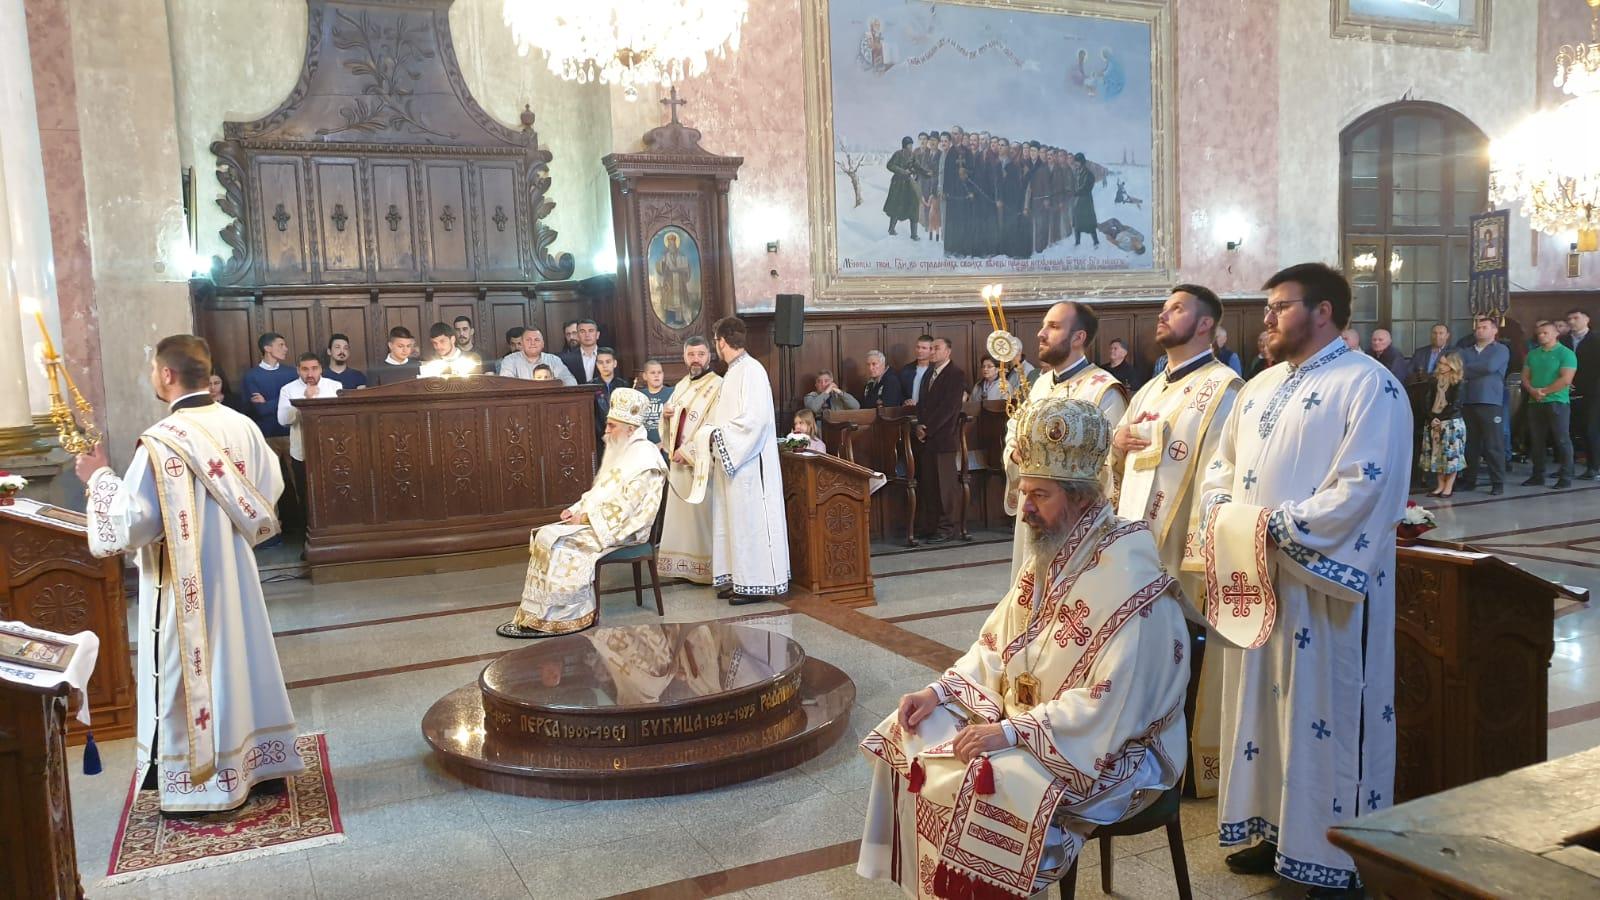 Uručen ugovor za rekonstrukciju fasade na dan hramovne slave